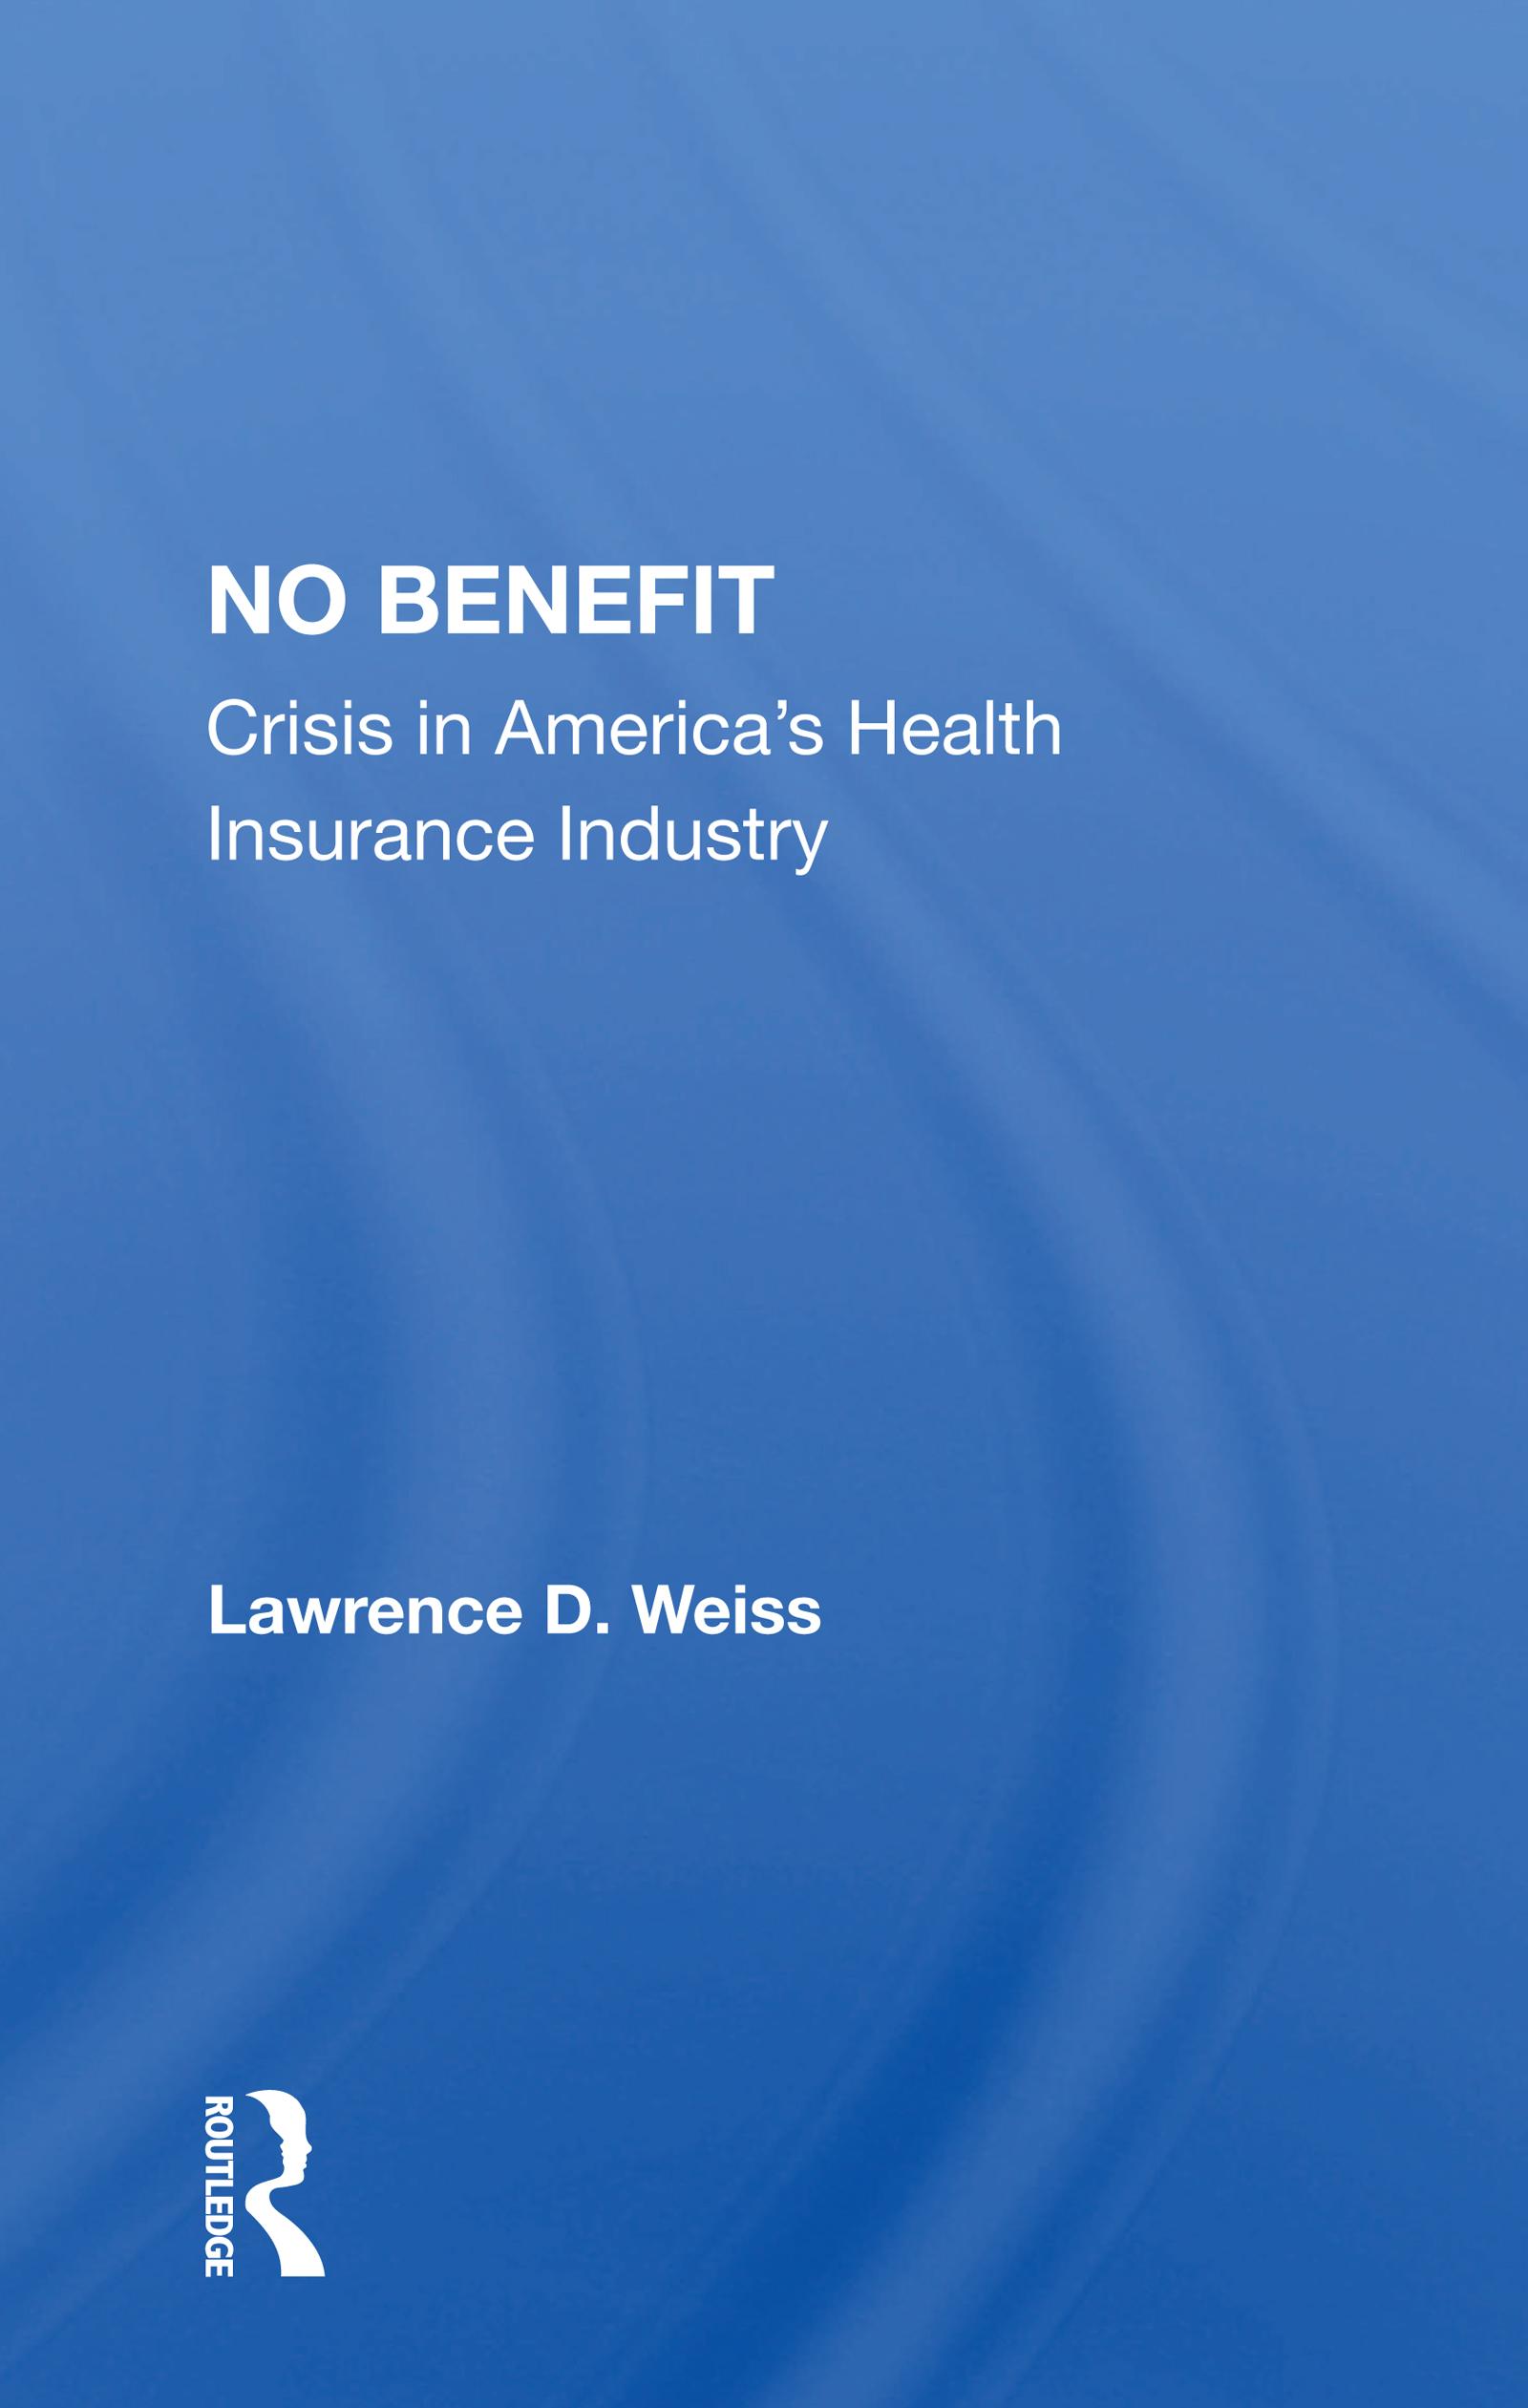 No Benefit